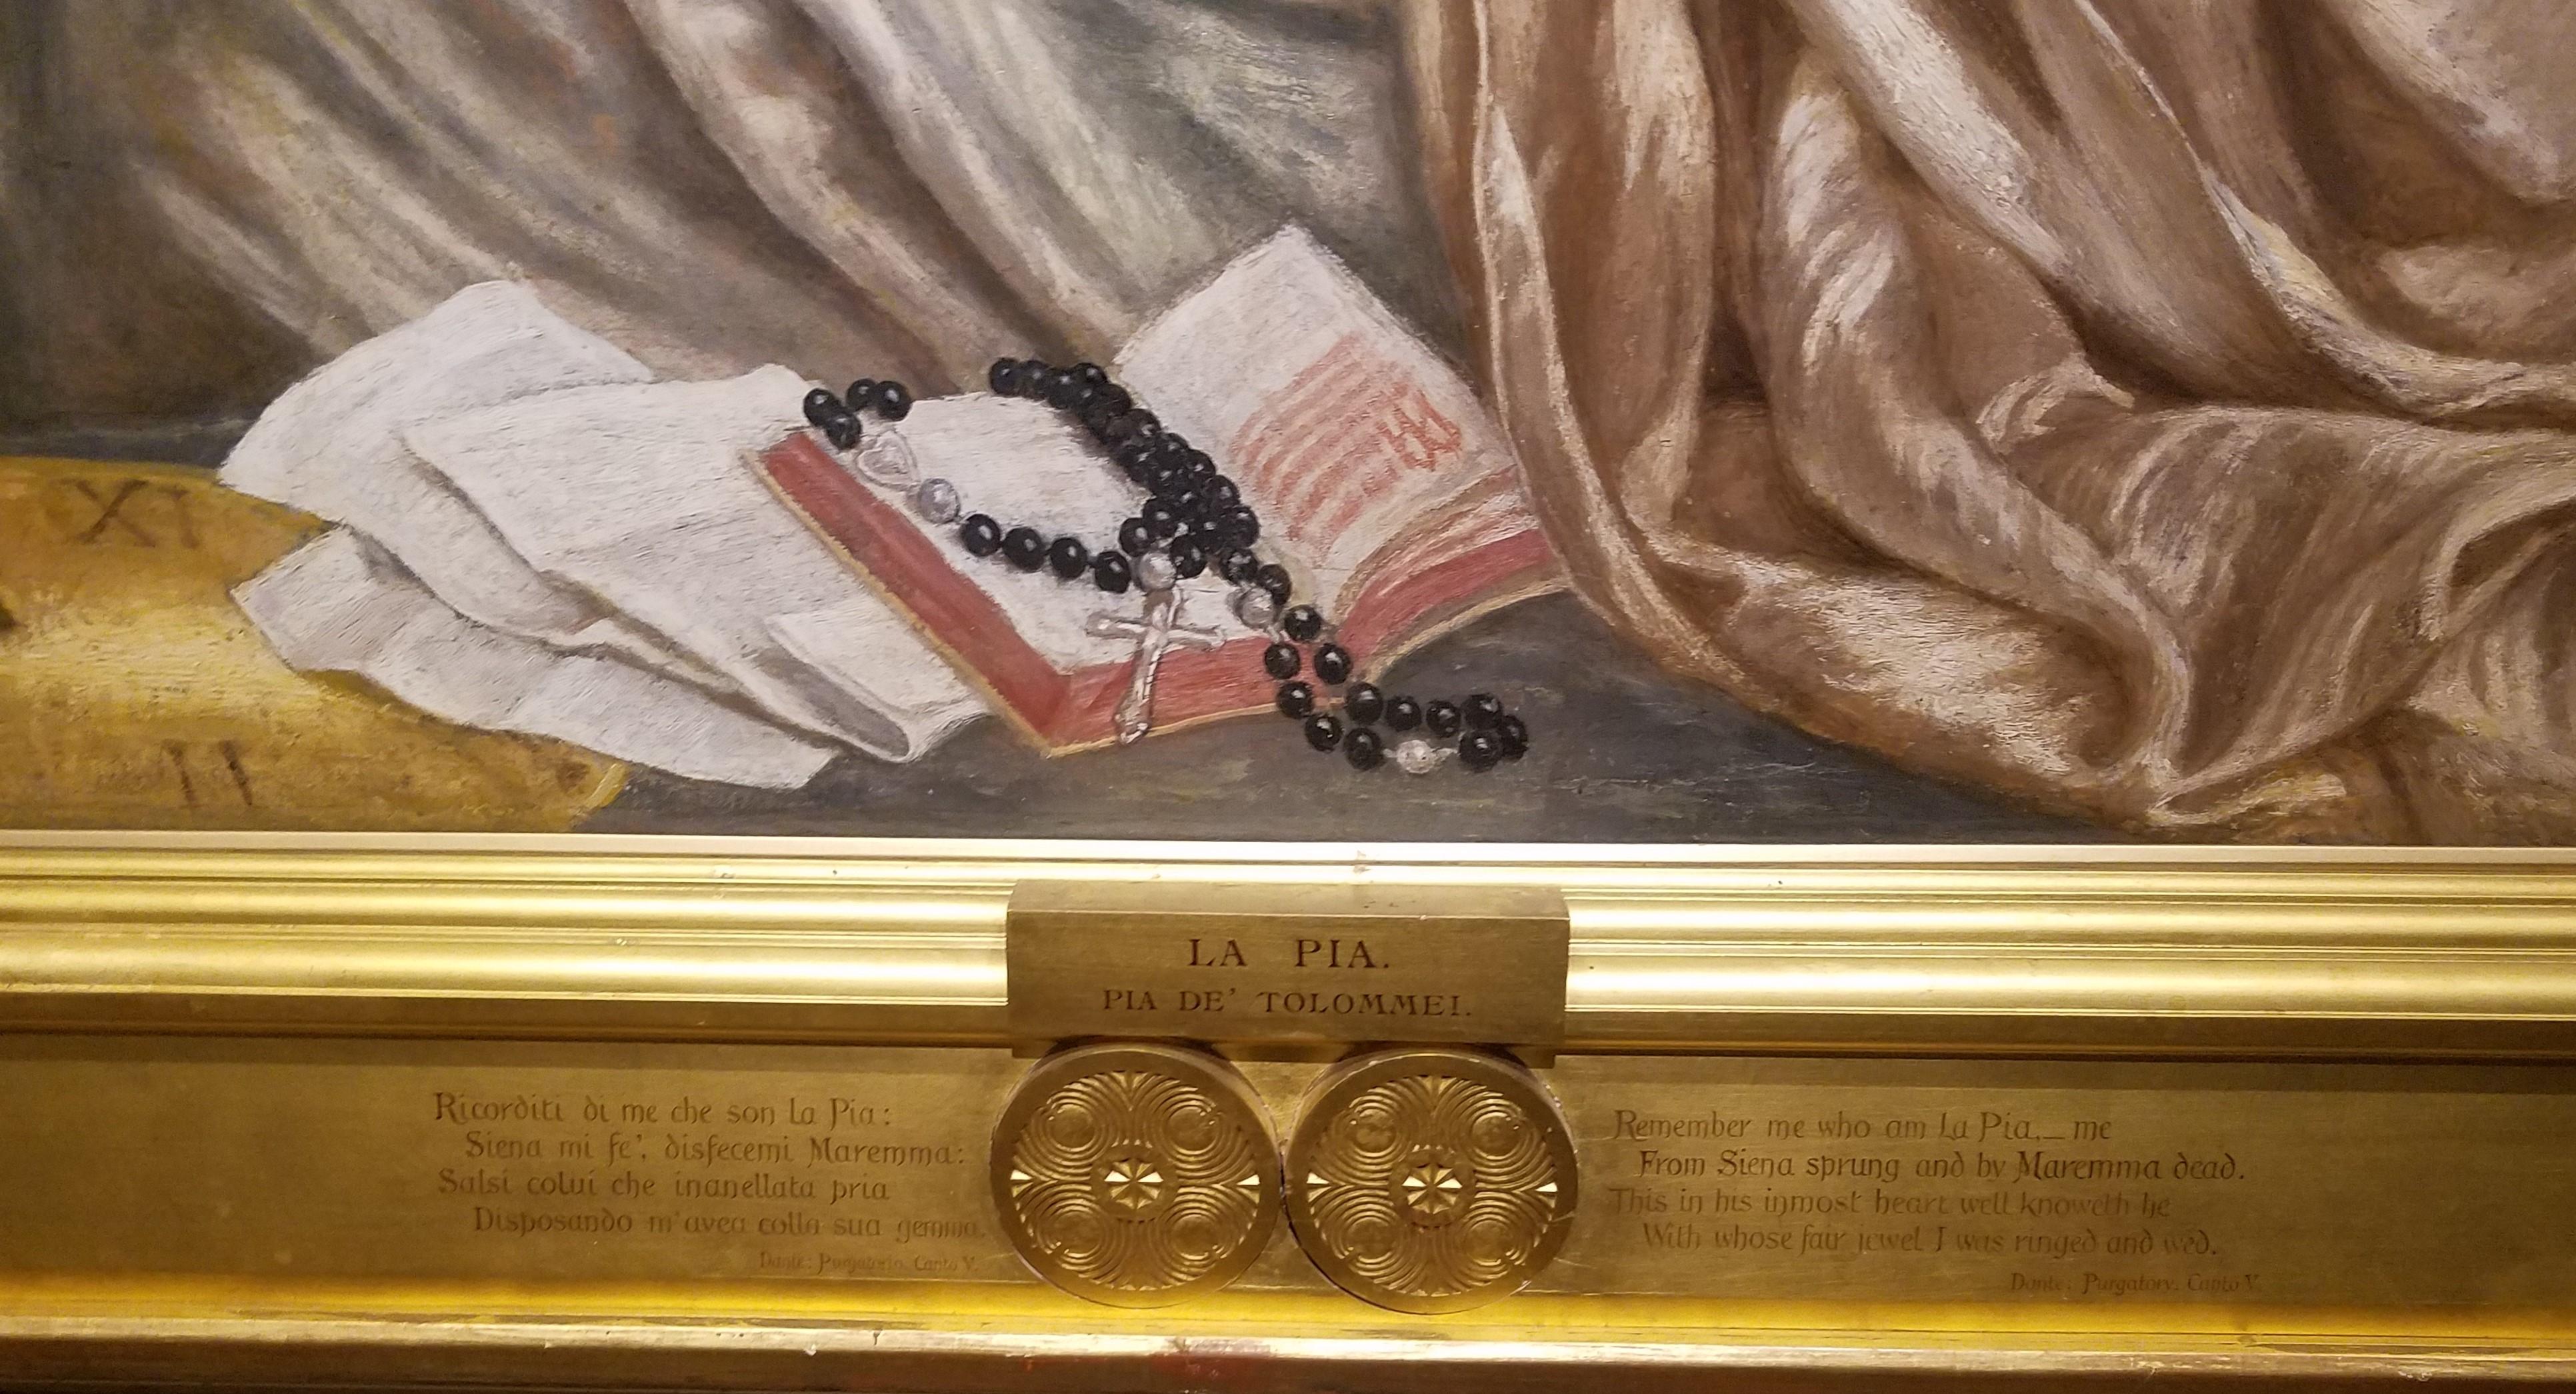 Art Arthound Fantasia T Shirt Pria Castlevania Death Frame Detail